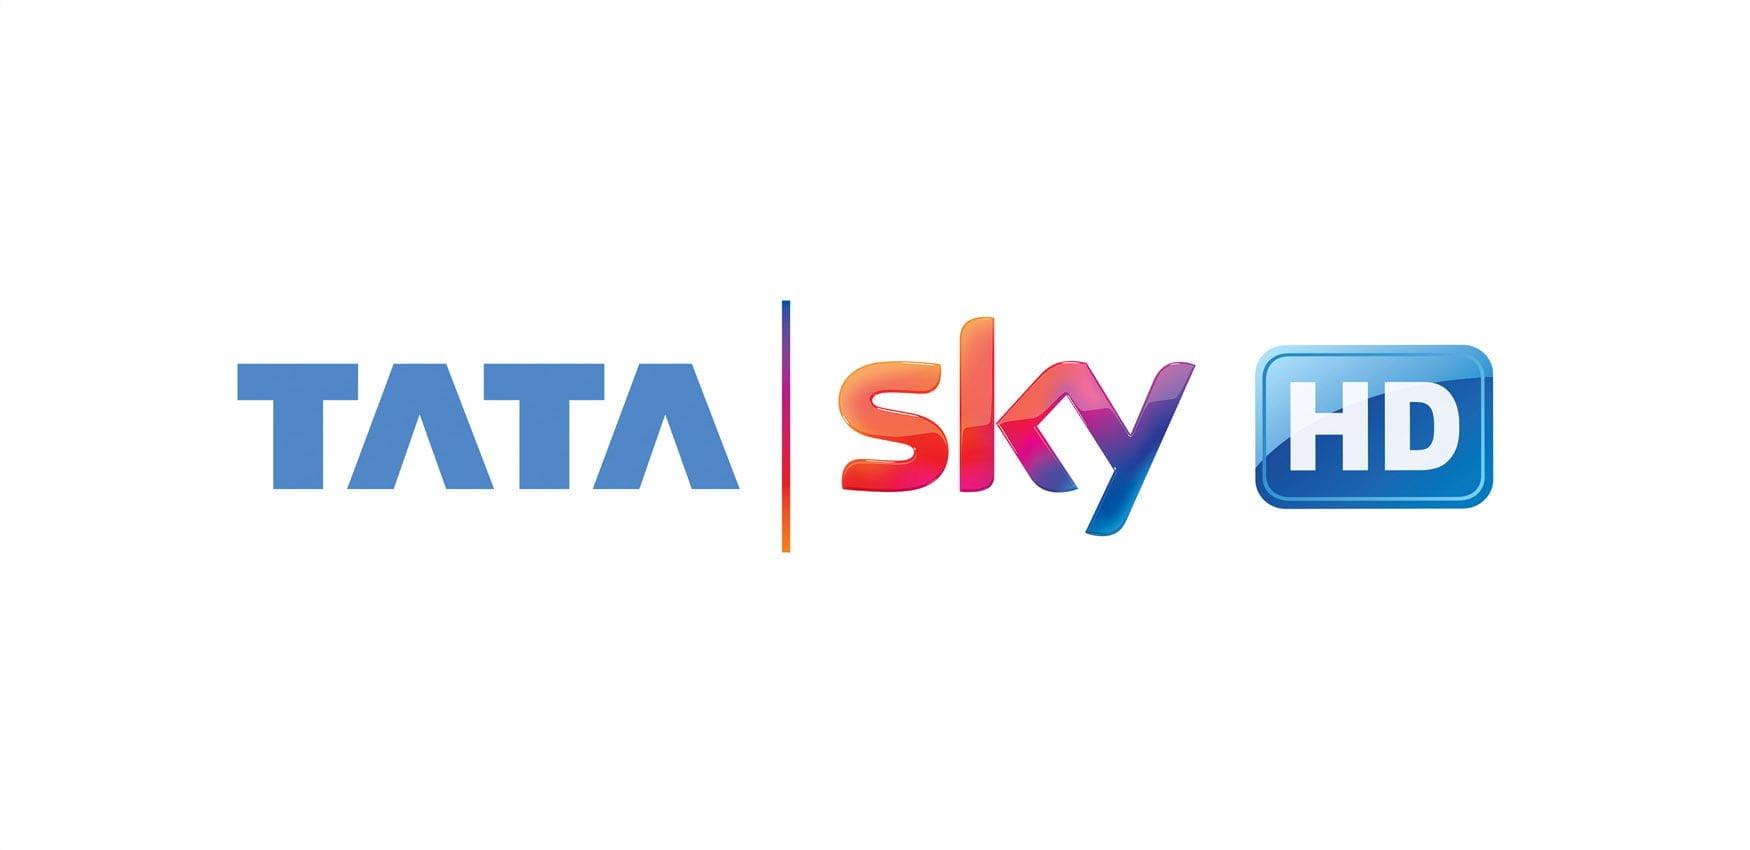 Tata Sky HD Logo